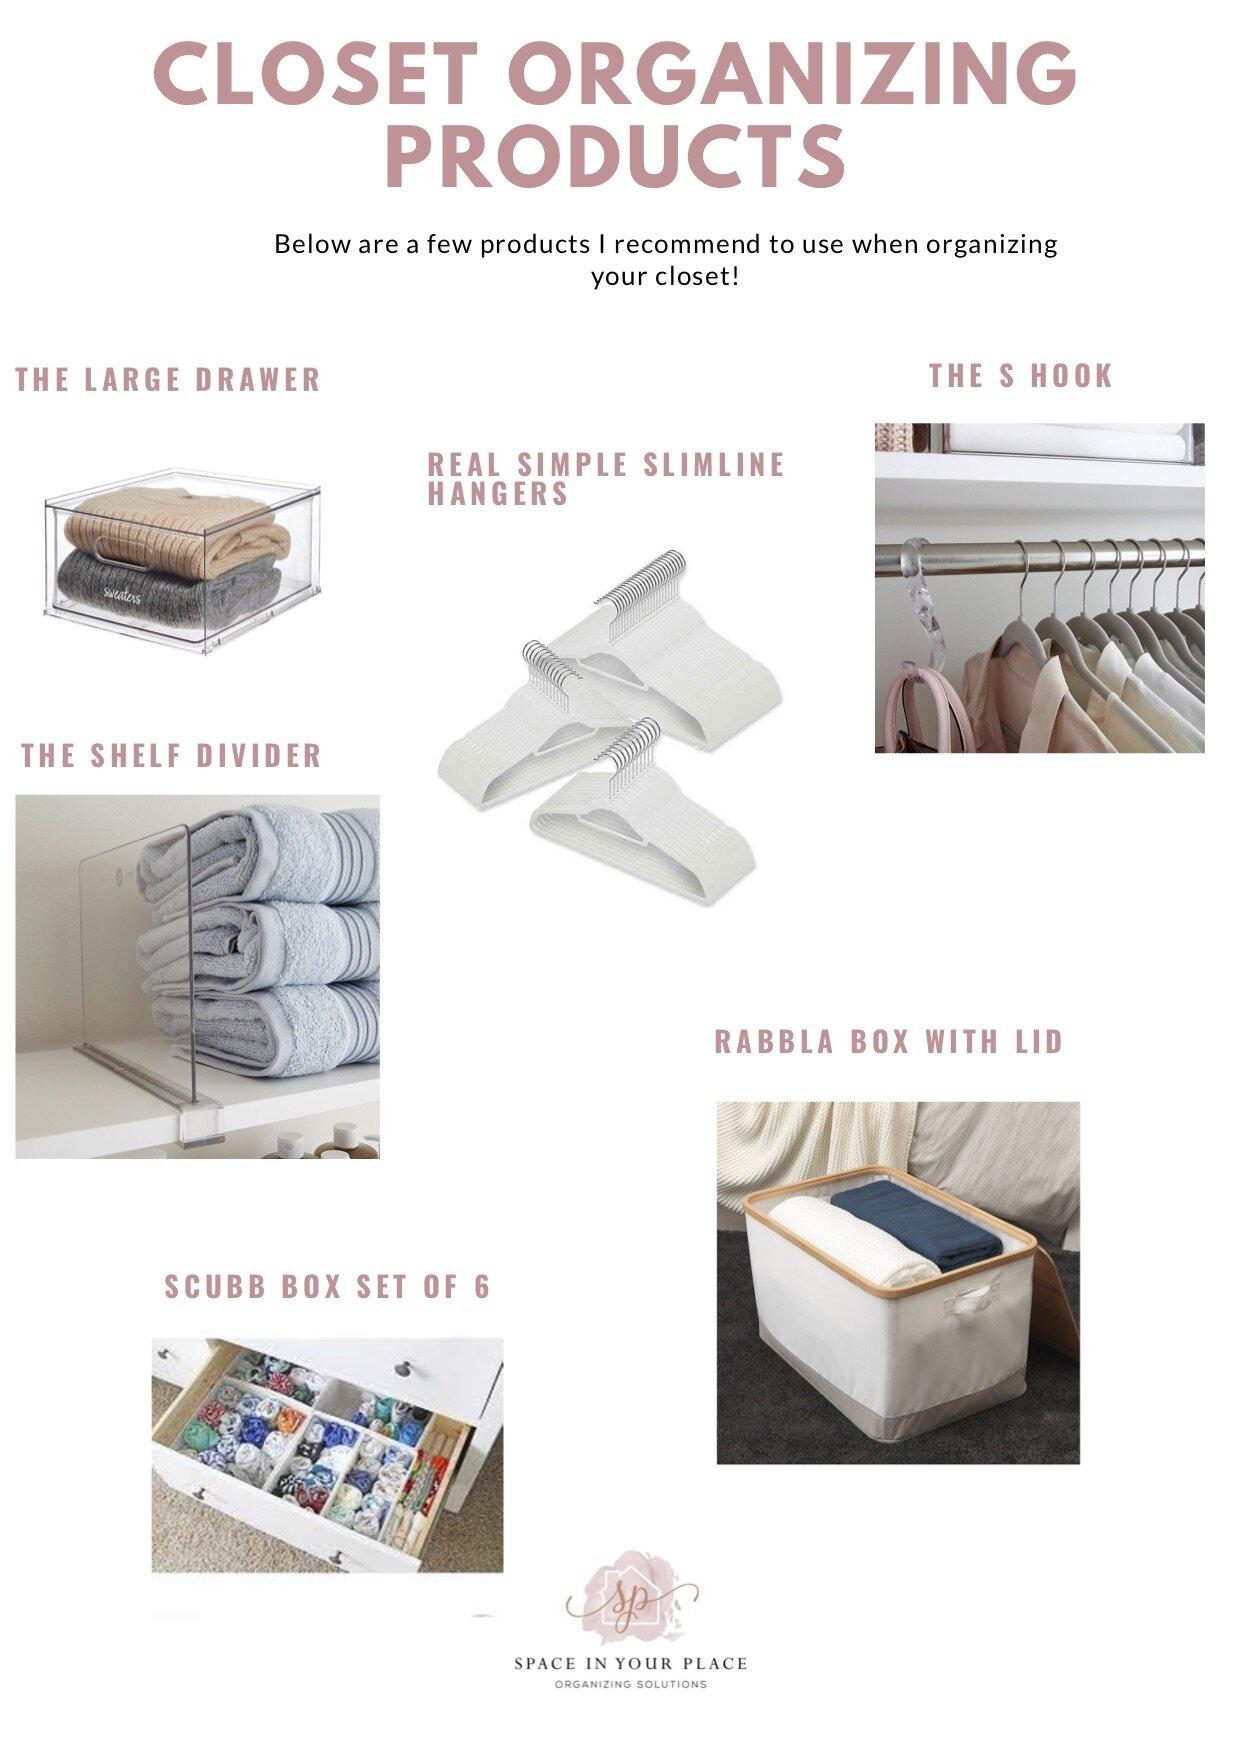 Closet organizing products -2.jpg